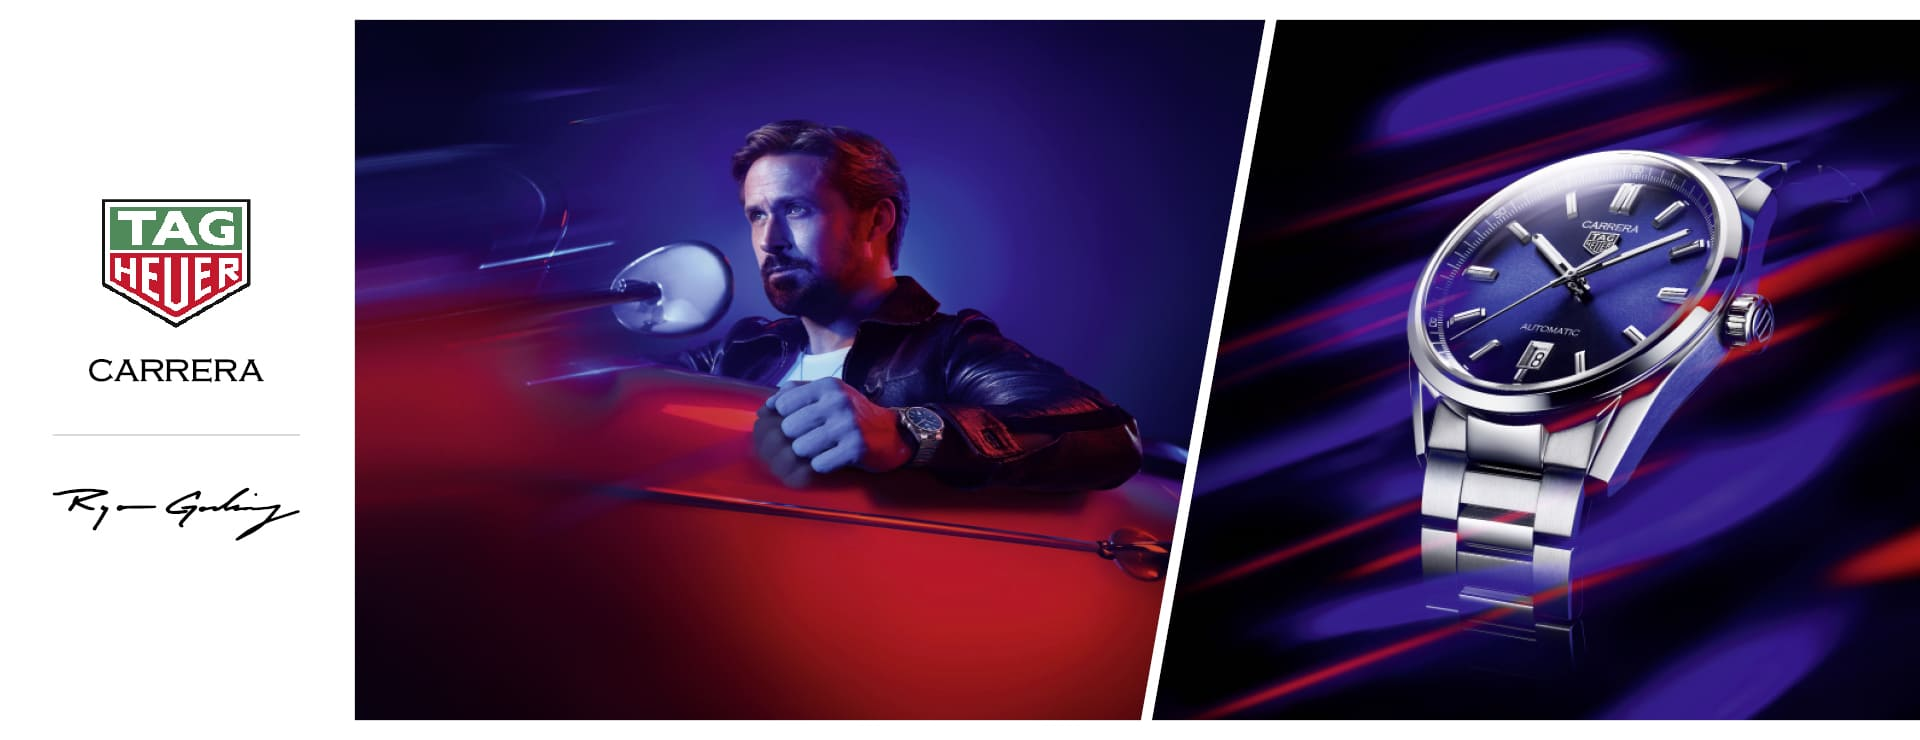 TAG Heuer Carrera meets Ryan Gosling